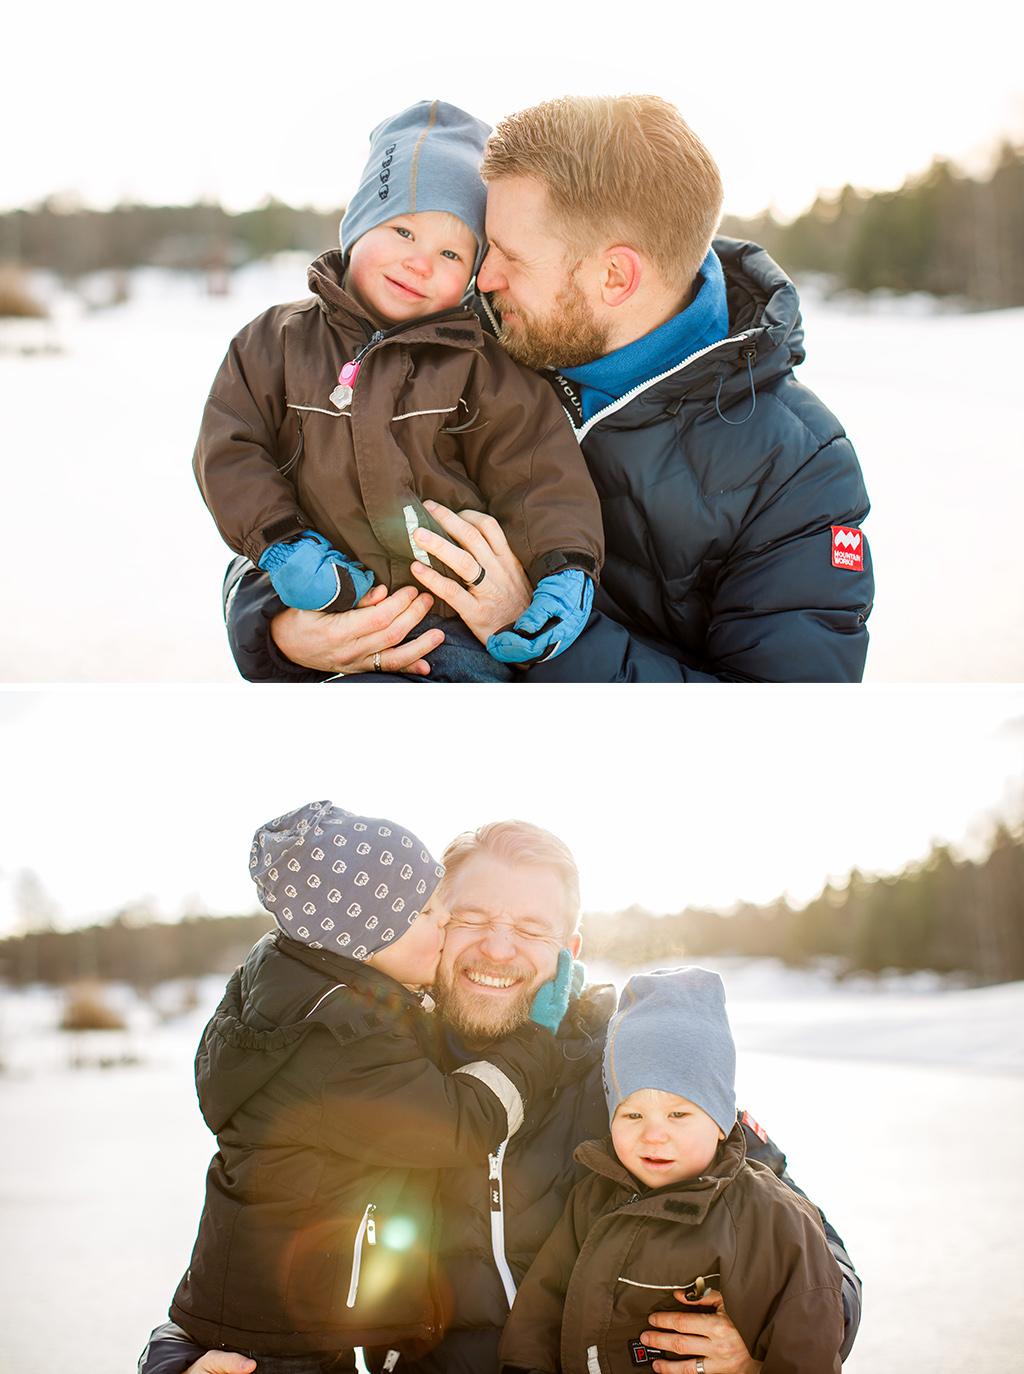 Vinter-familjefotografering-familjefotograf-Stockholm_3.jpg